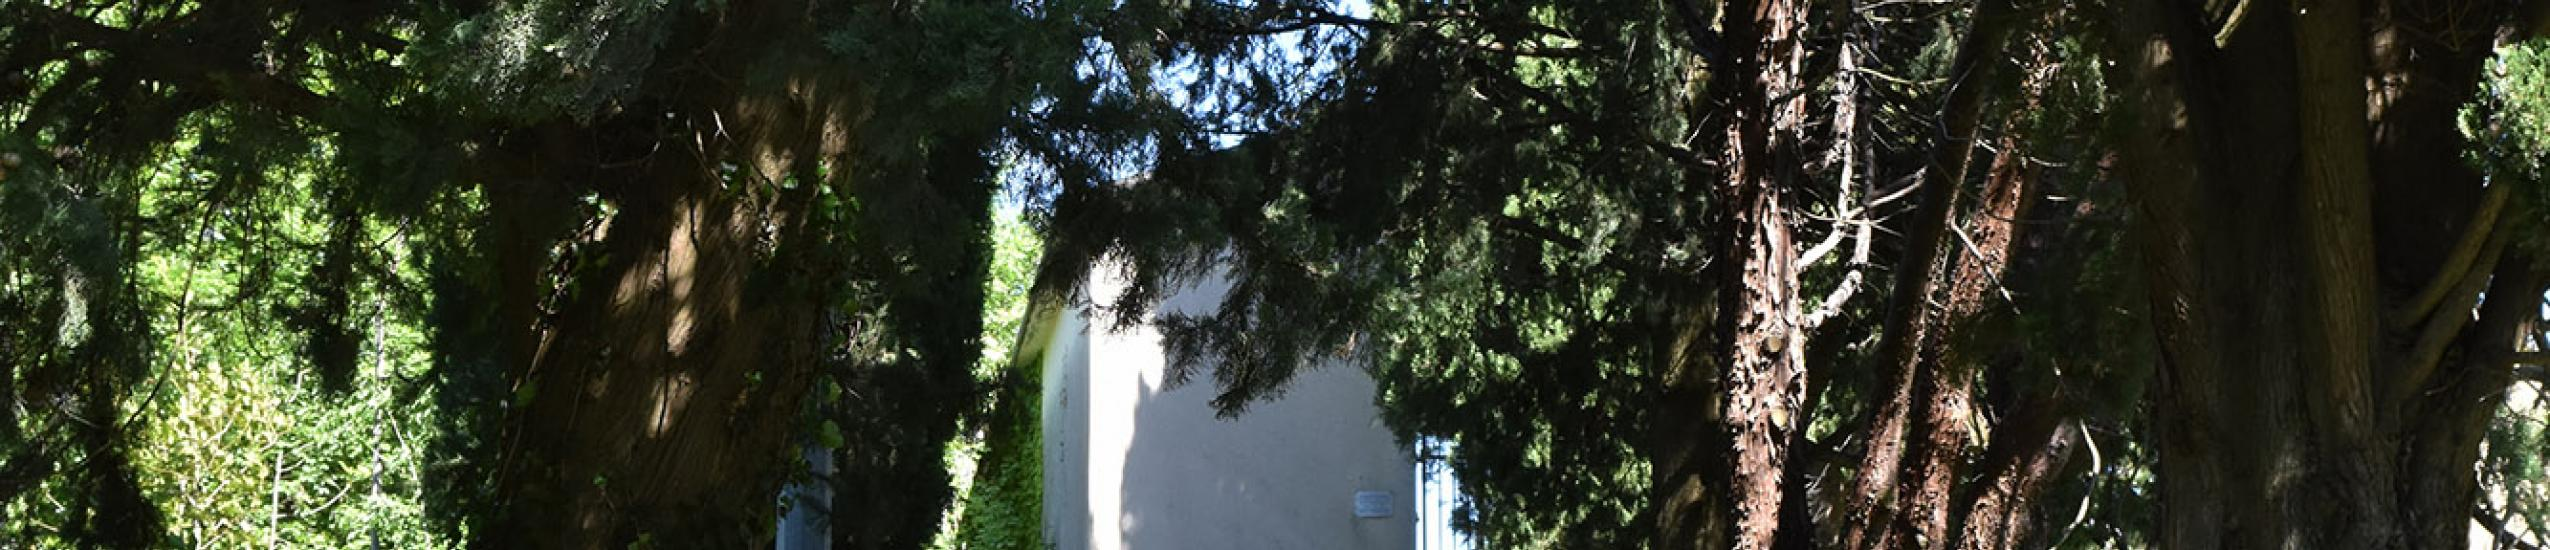 Cimitero Coreglia Ligure (0)